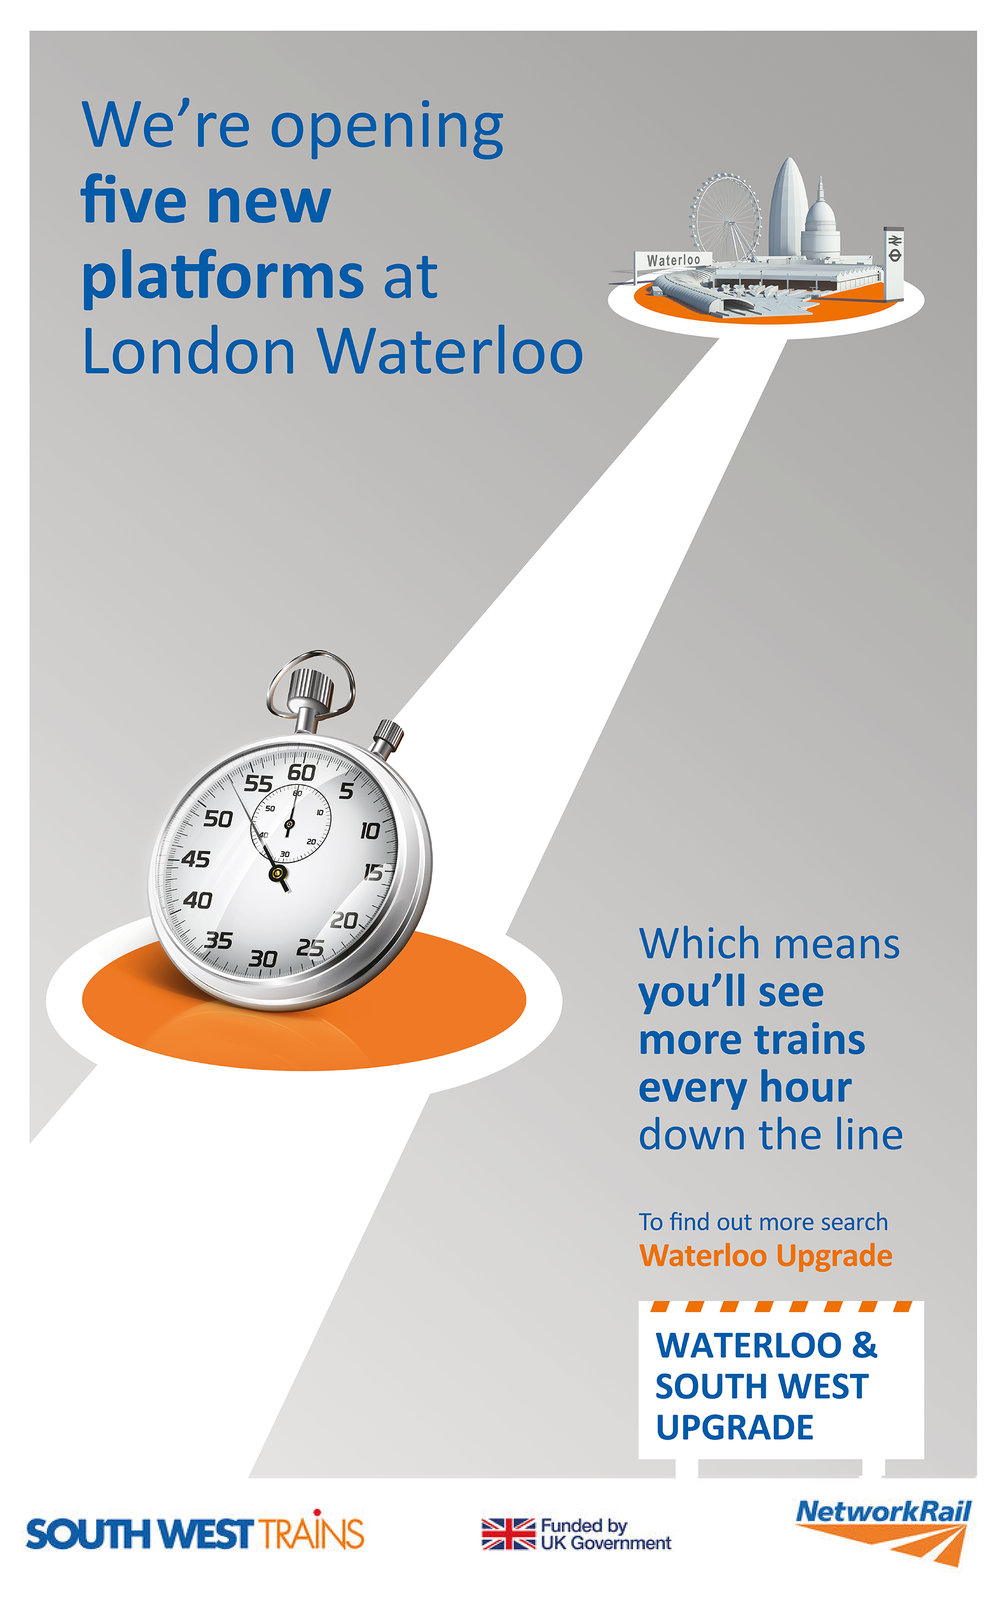 500624_SWT_Waterloo_Benefits_Posters3.jpg